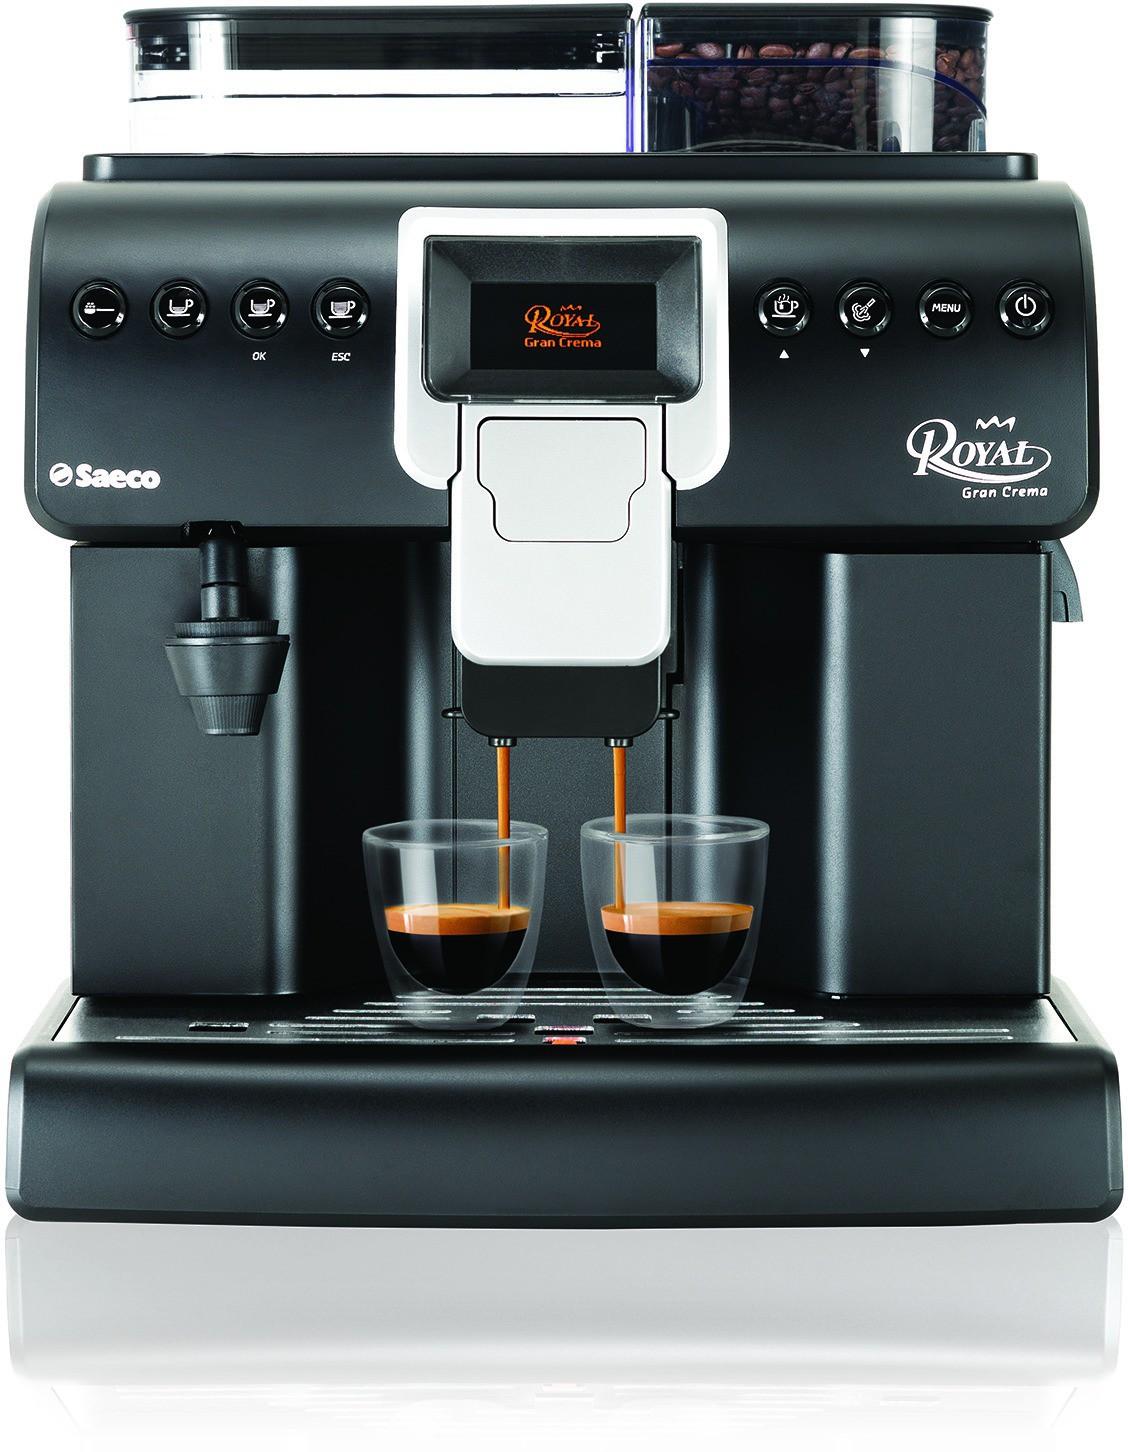 Saeco Royal Gran Crema Coffee Machine 25 Cups Coffee Maker(Dark Grey)